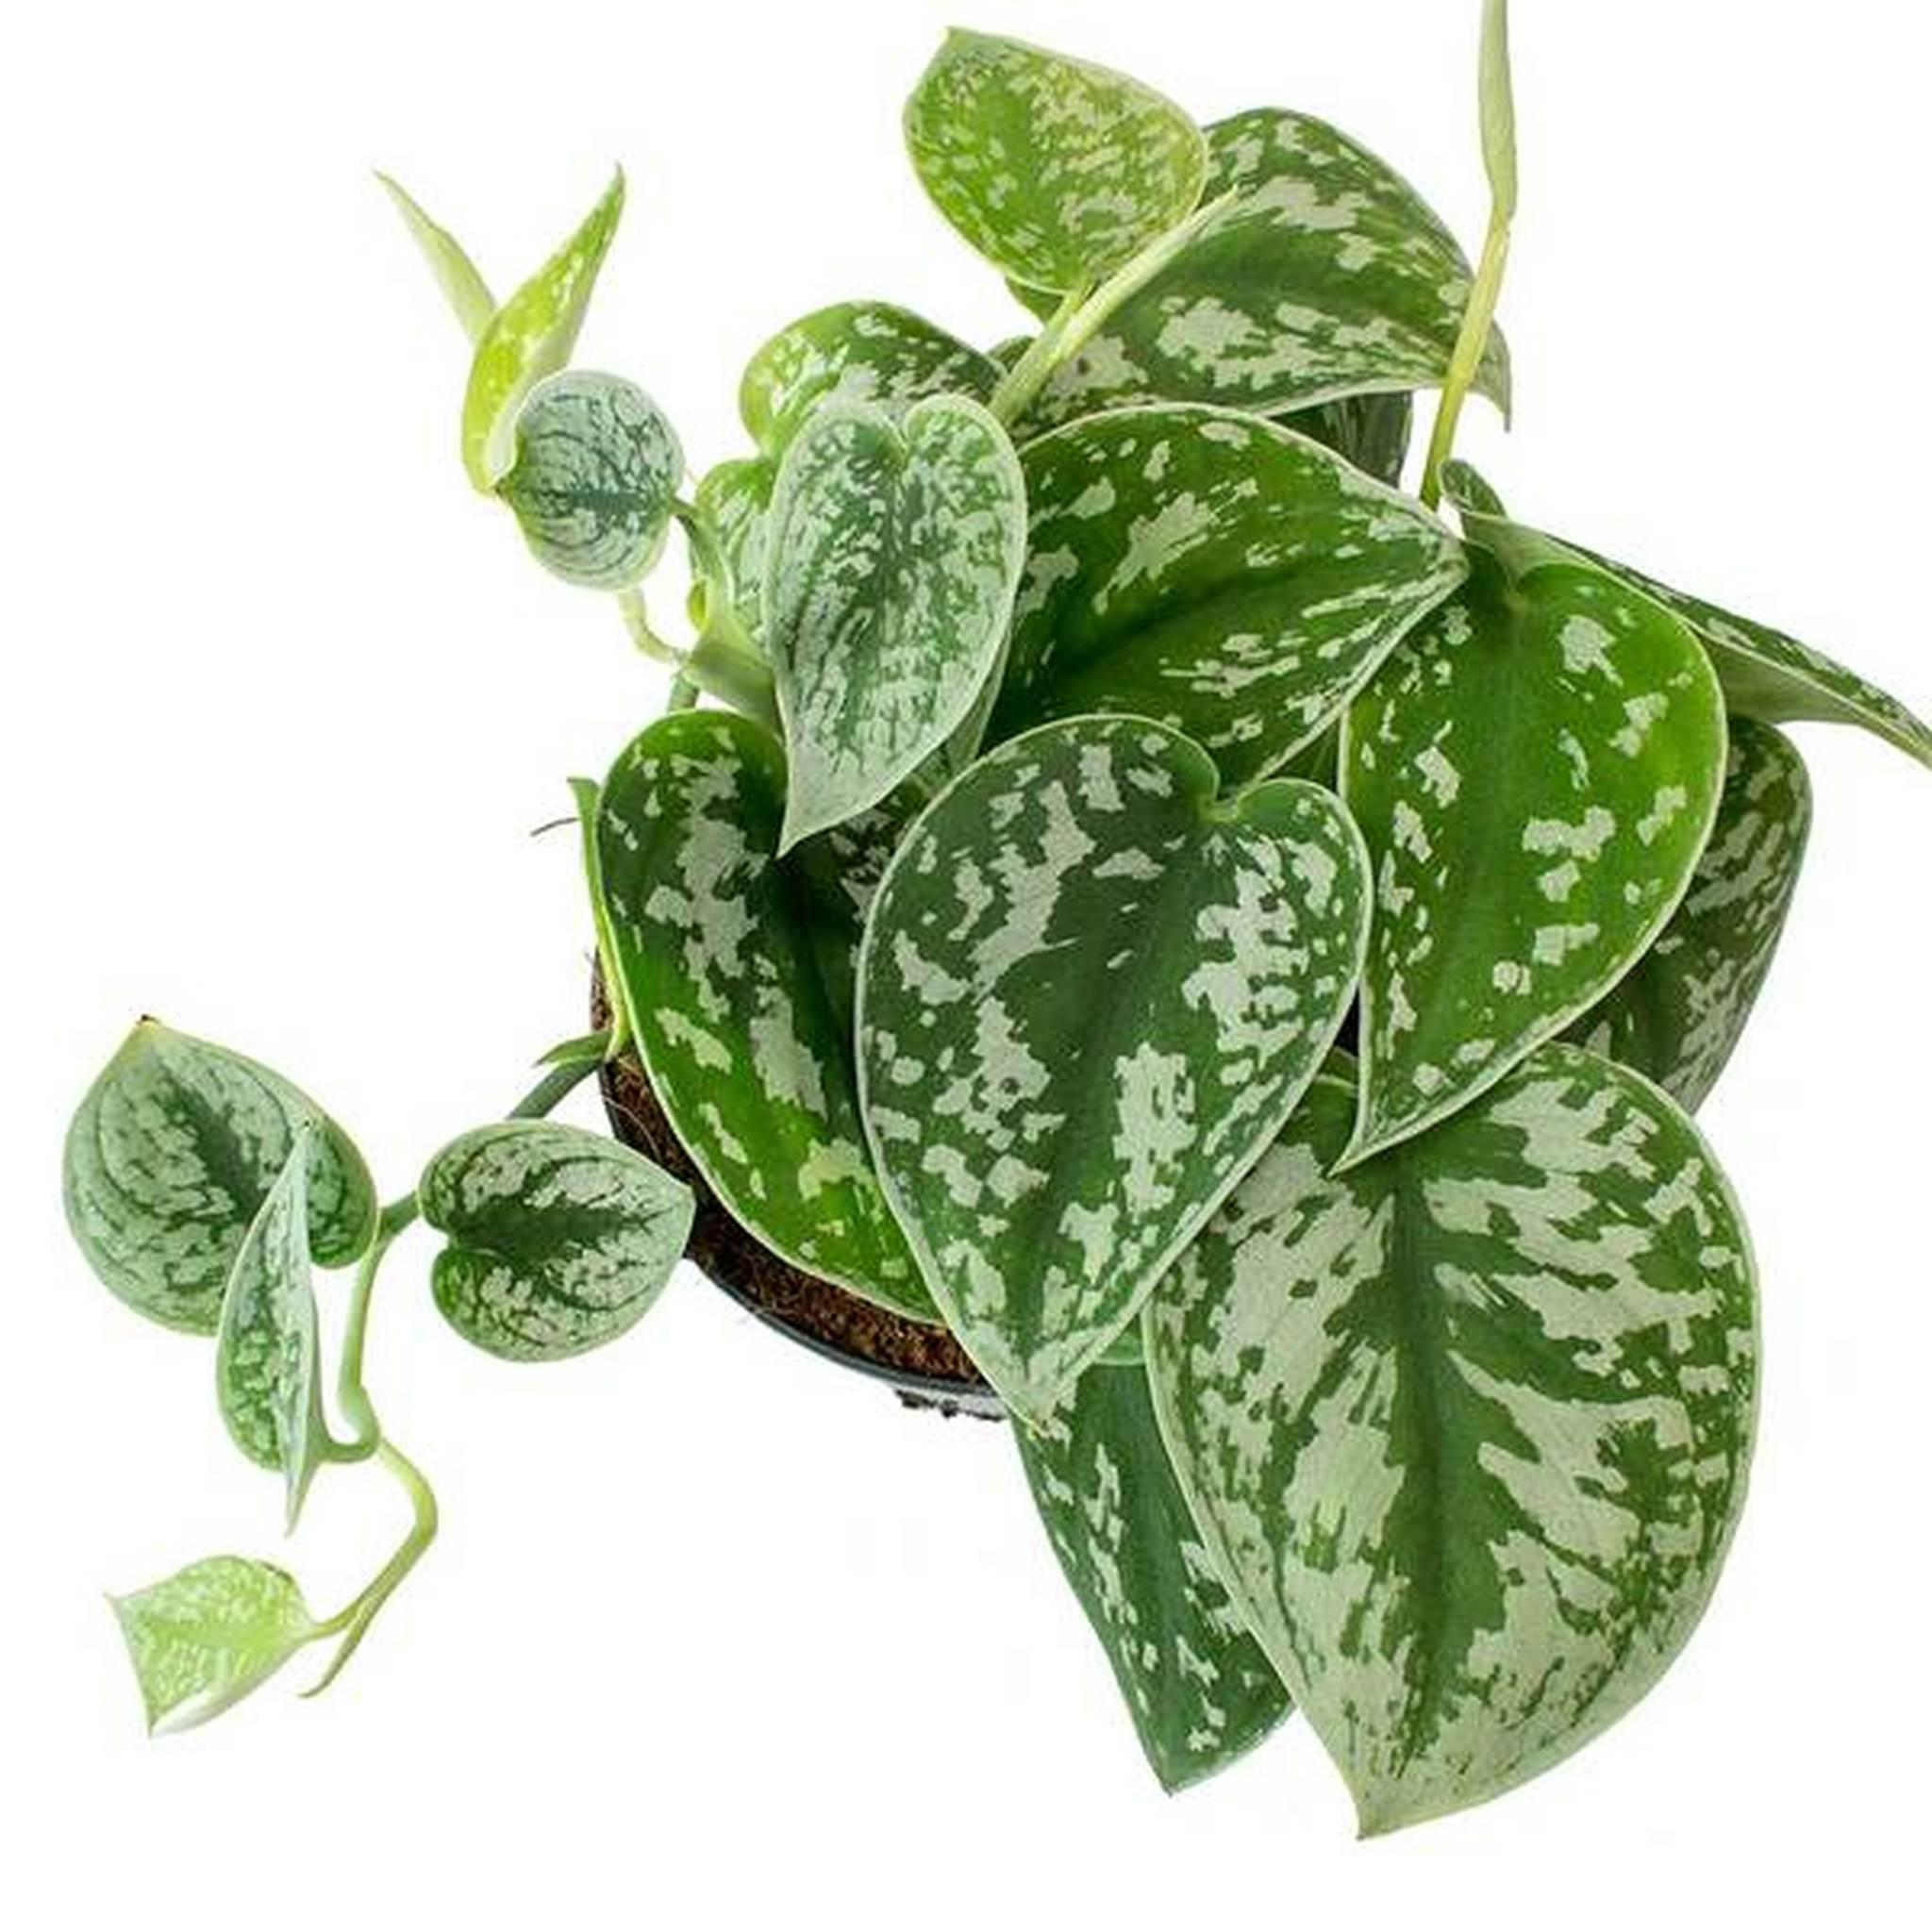 بيكتوس تريبي نباتات داخلية شجيرات